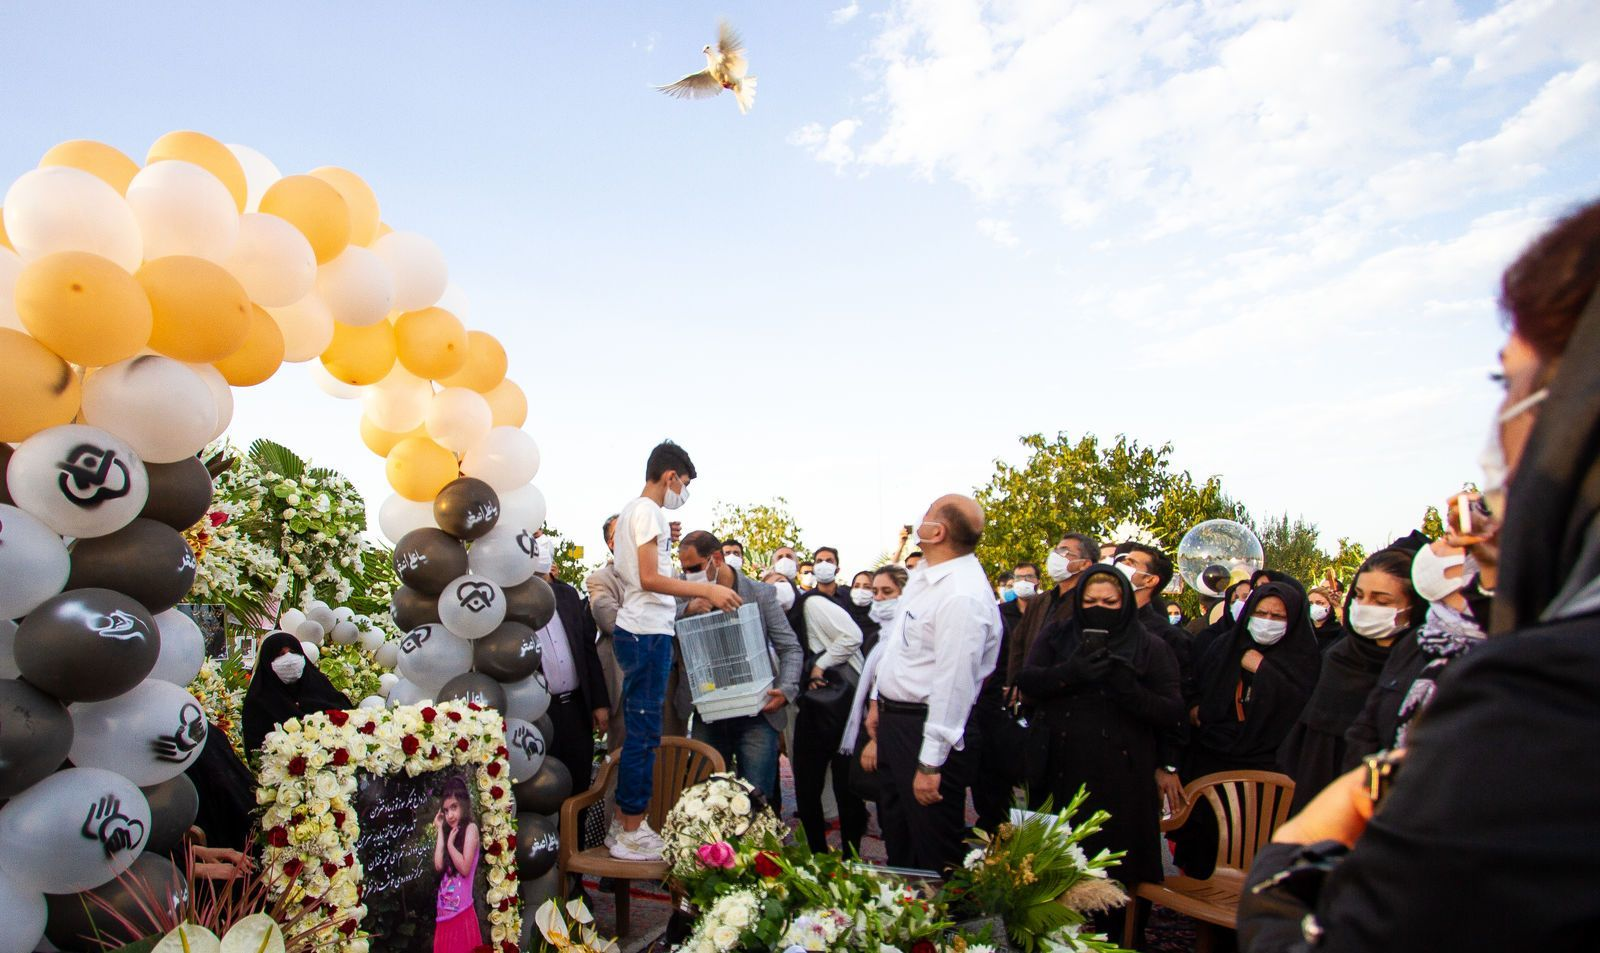 تولد ویانا فرزند مدافعان سلامت بر سر مزارش + عکس